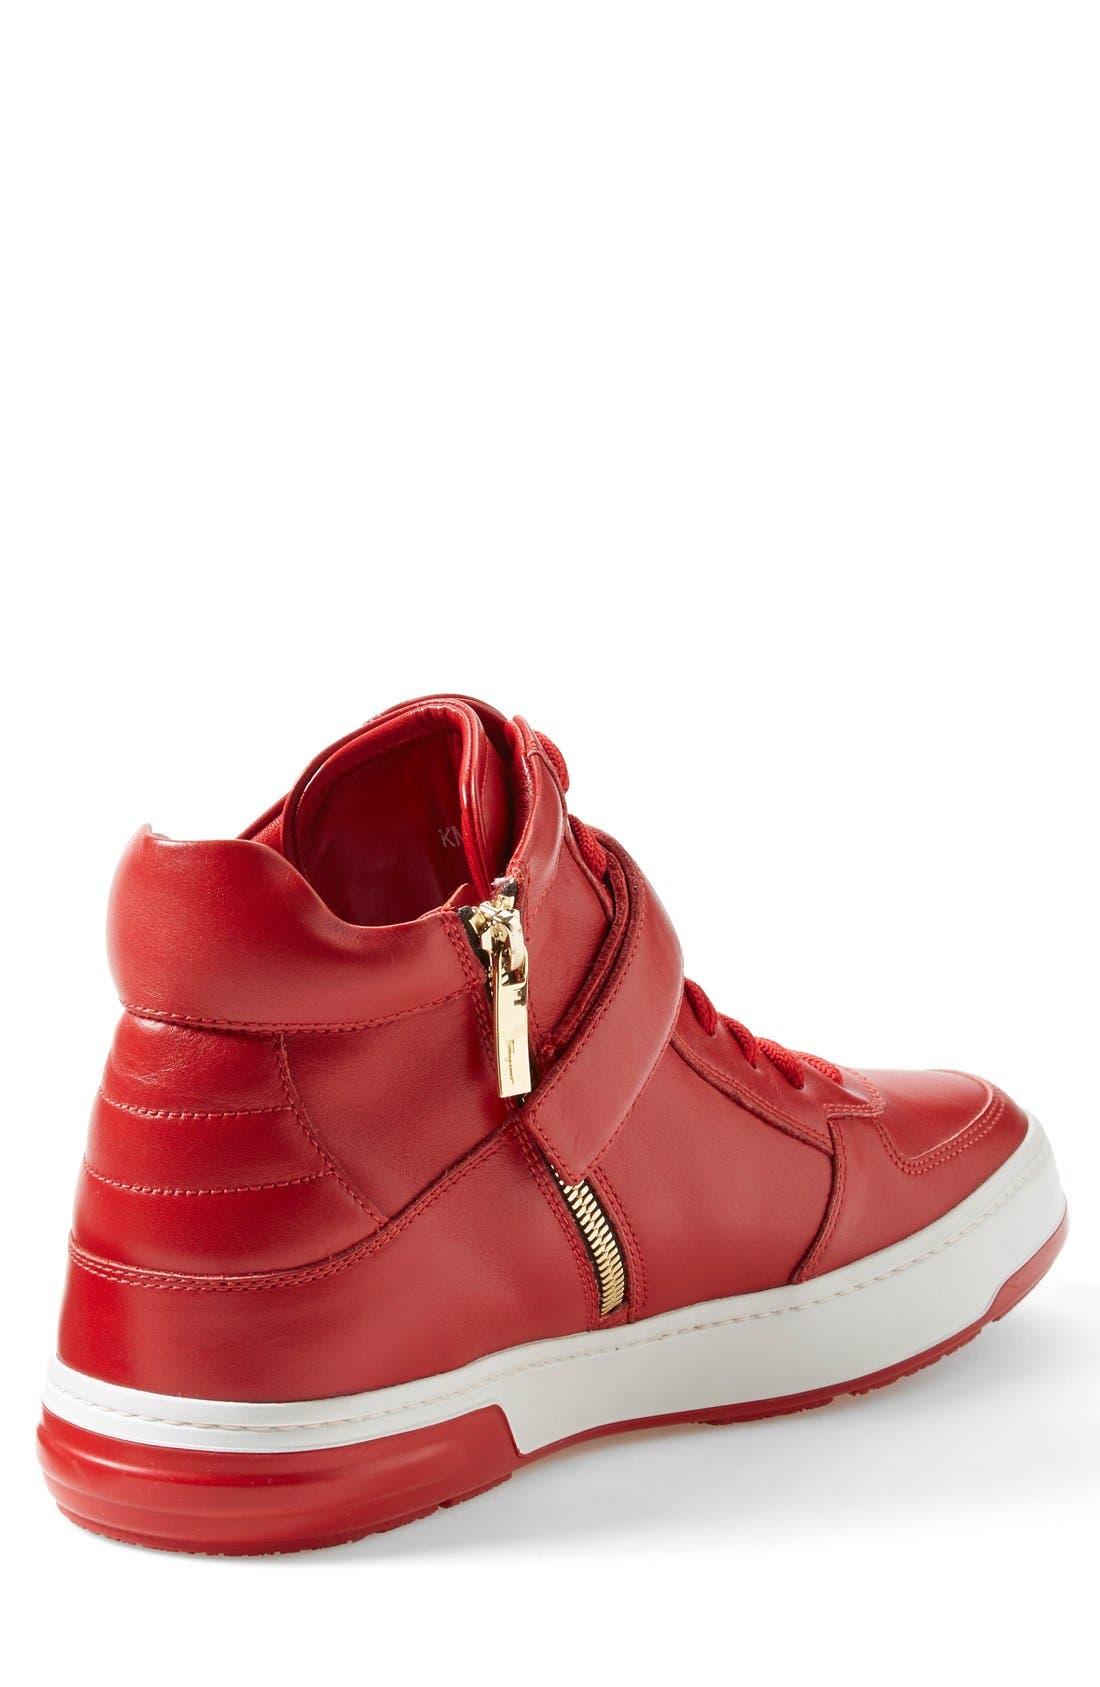 Alternate Image 2  - Salvatore Ferragamo 'Nayon' High Top Sneaker (Men)